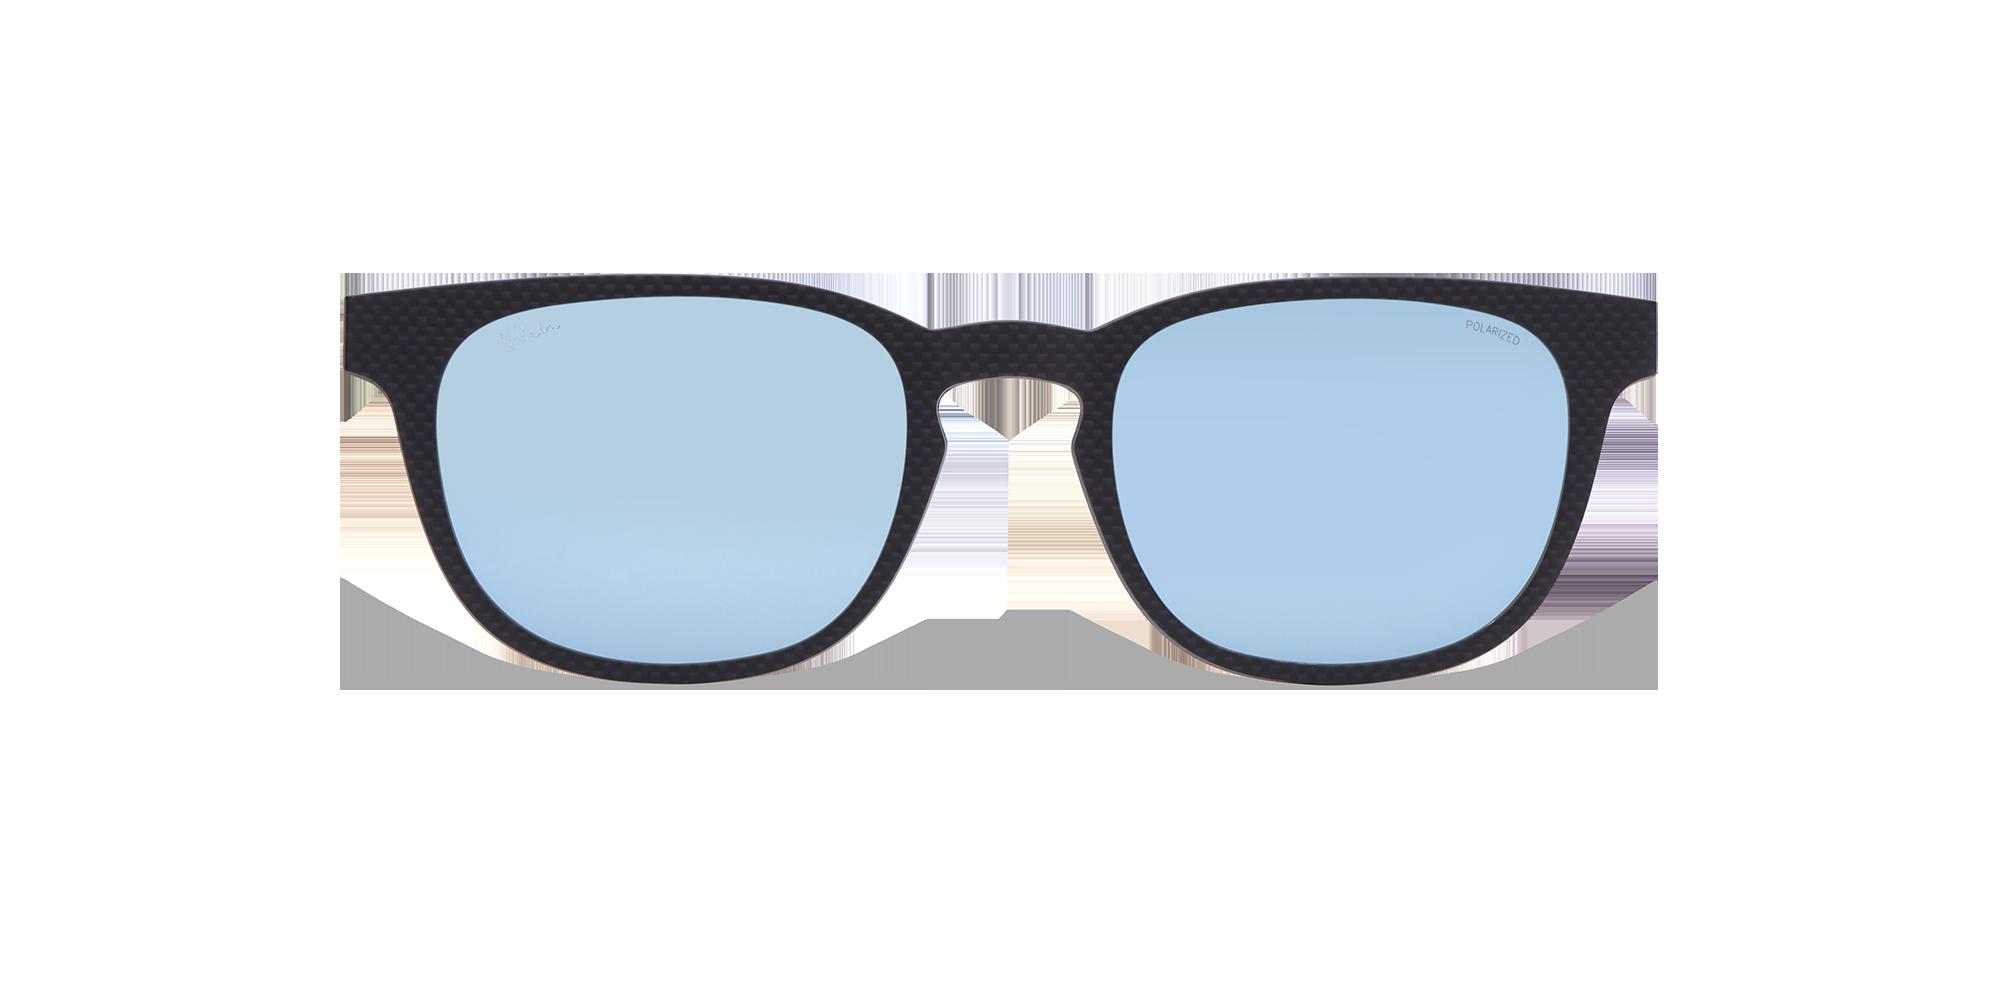 afflelou/france/products/smart_clip/clips_glasses/TMK33PRBK015120.png